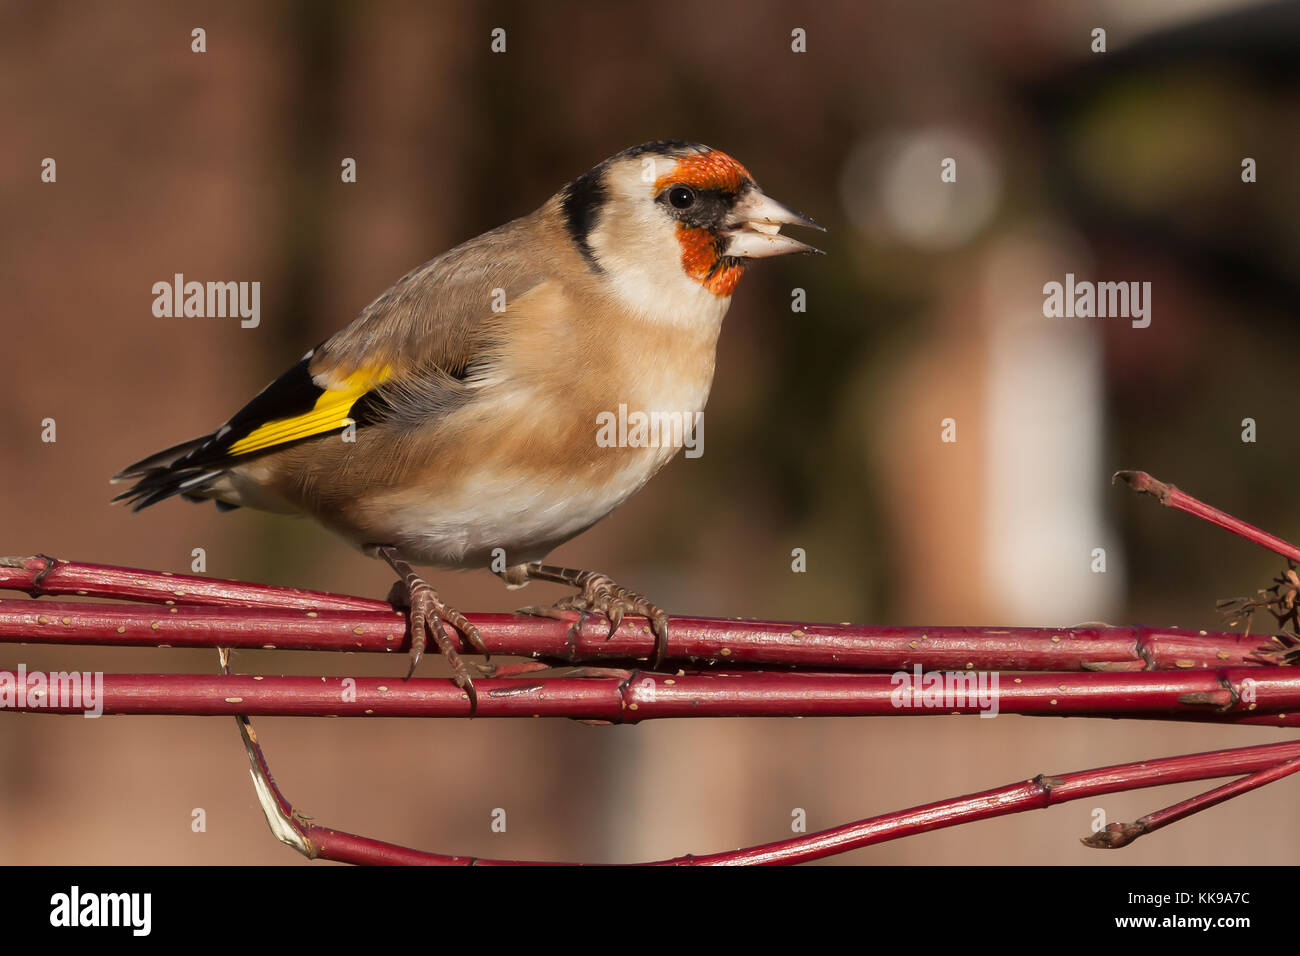 Splendido Uccellino Immagini Splendido Uccellino Fotos Stock Alamy